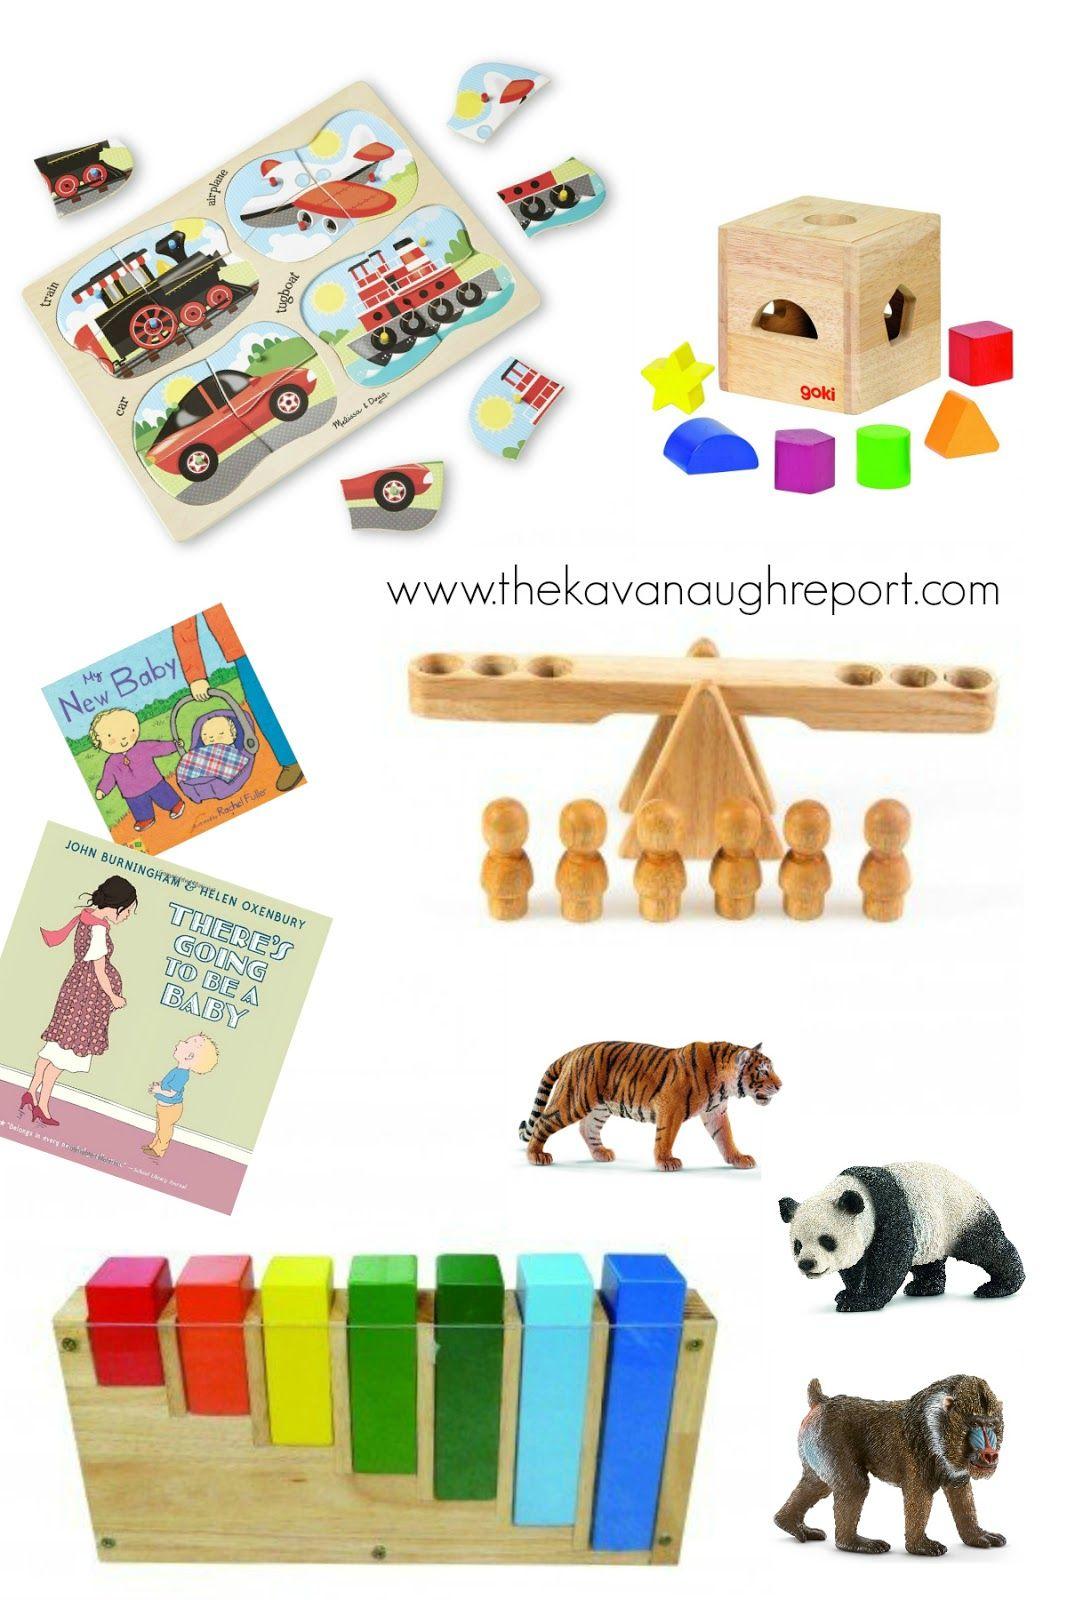 2 Year Old Birthday Gifts Montessori Toys Toddler Boy